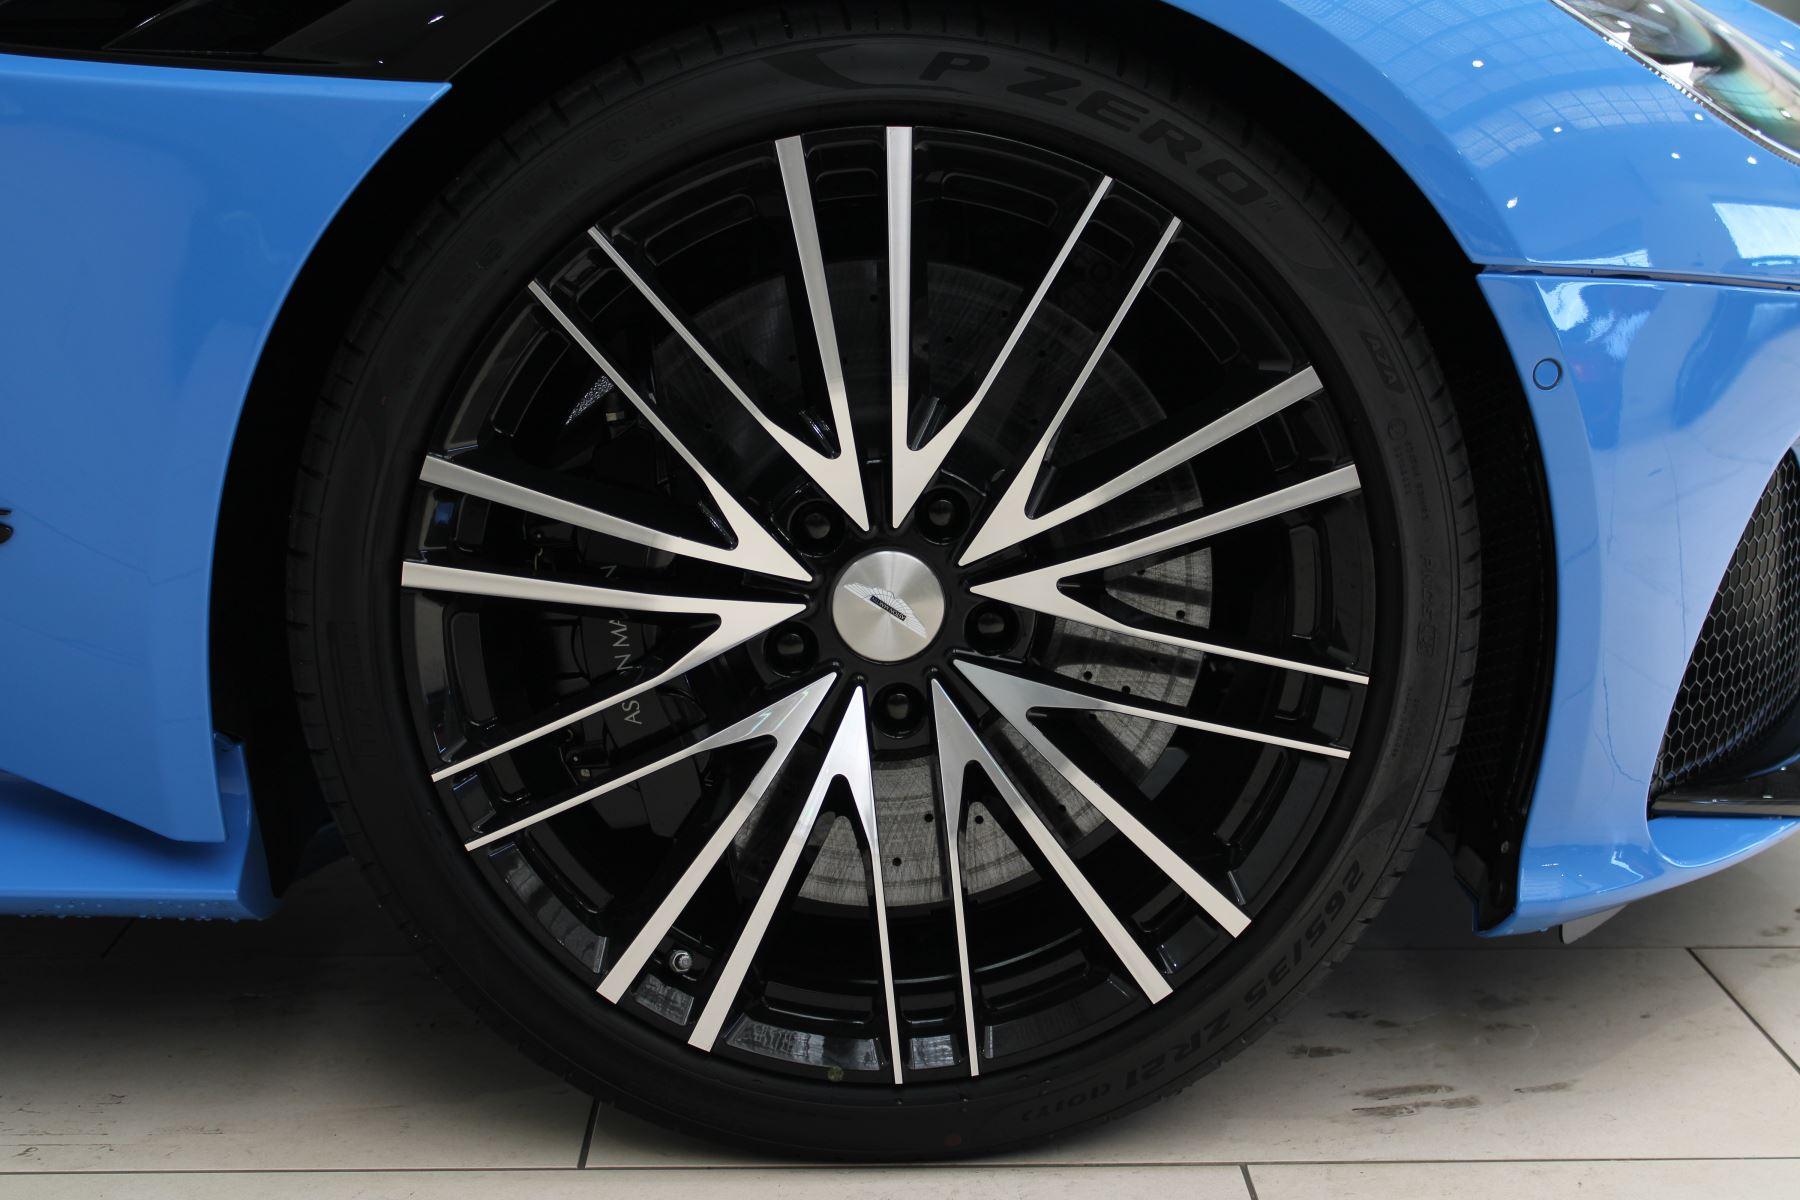 Aston Martin DBS V12 Superleggera Touchtronic Special Ceramic Blue - B&O image 10